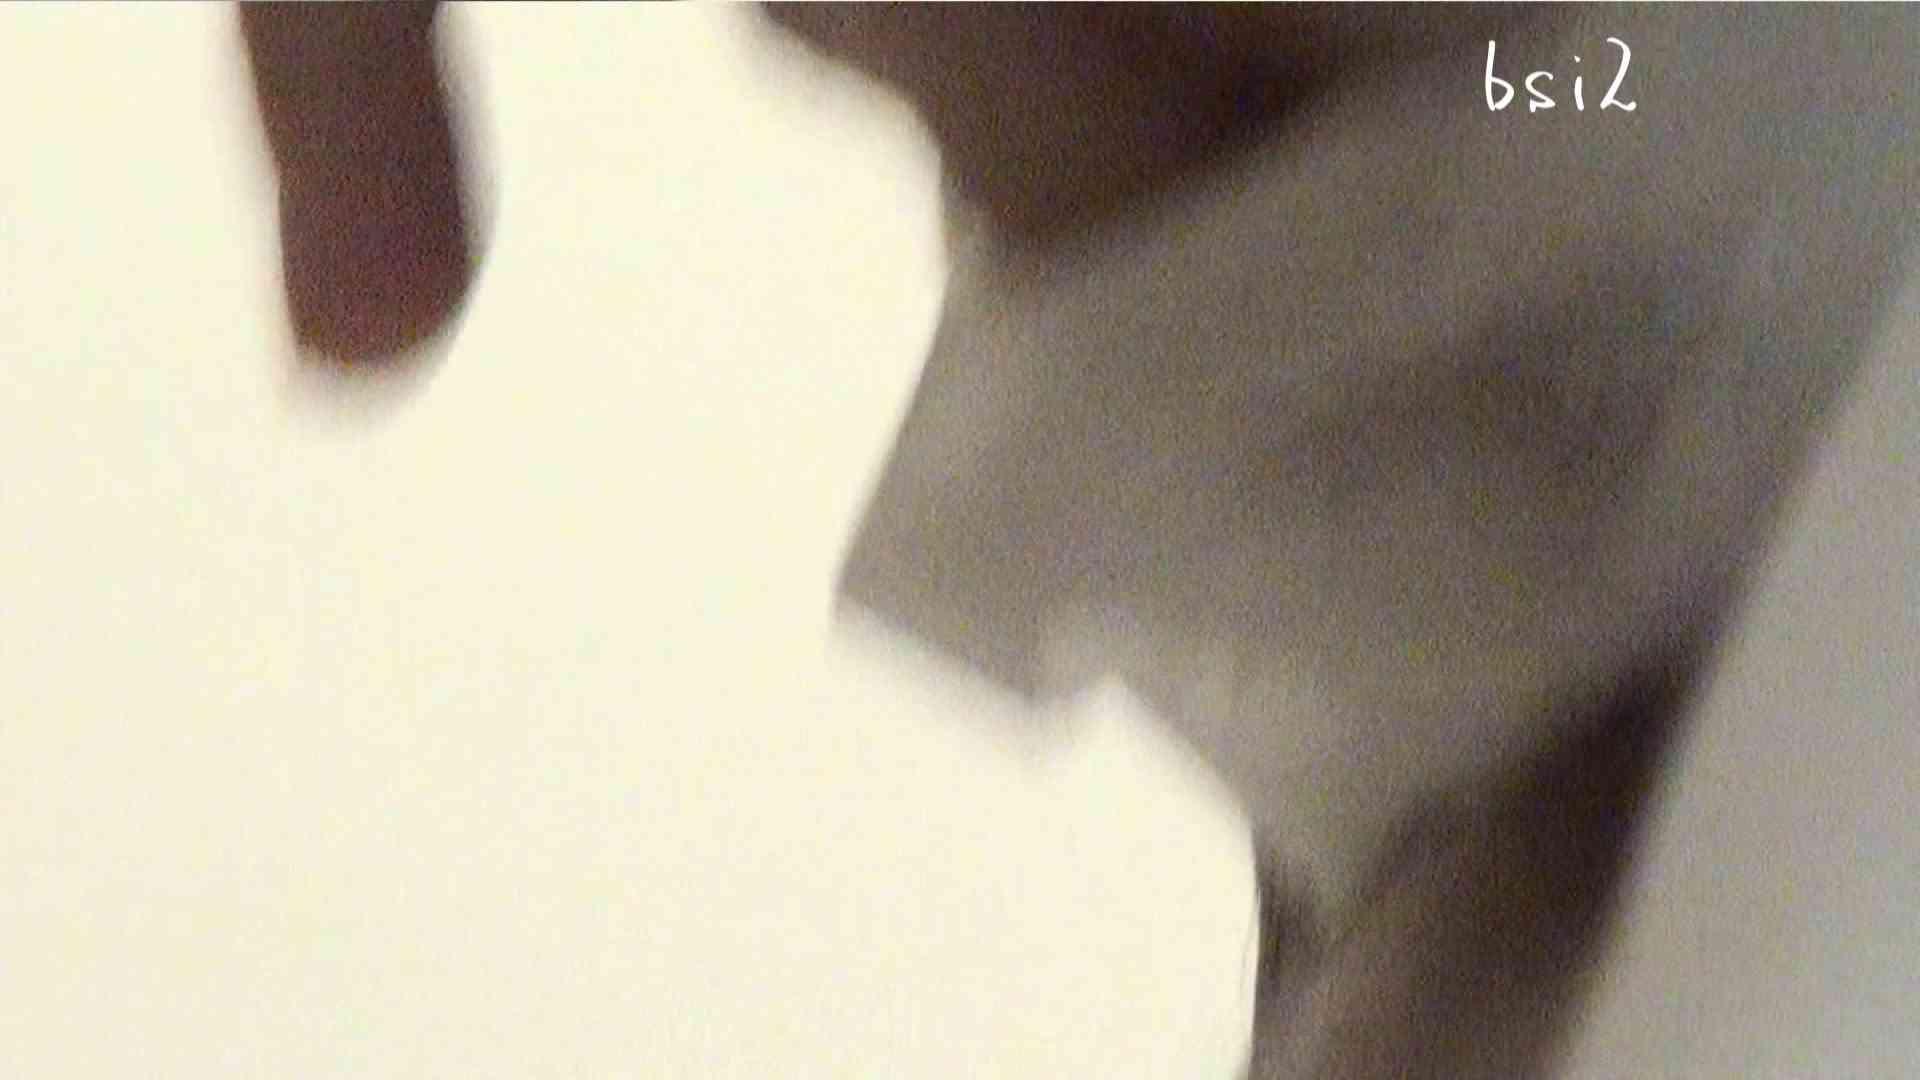 至高下半身盗撮-PREMIUM-【院内病棟編 】VOL2 盛合せ セックス無修正動画無料 108枚 80